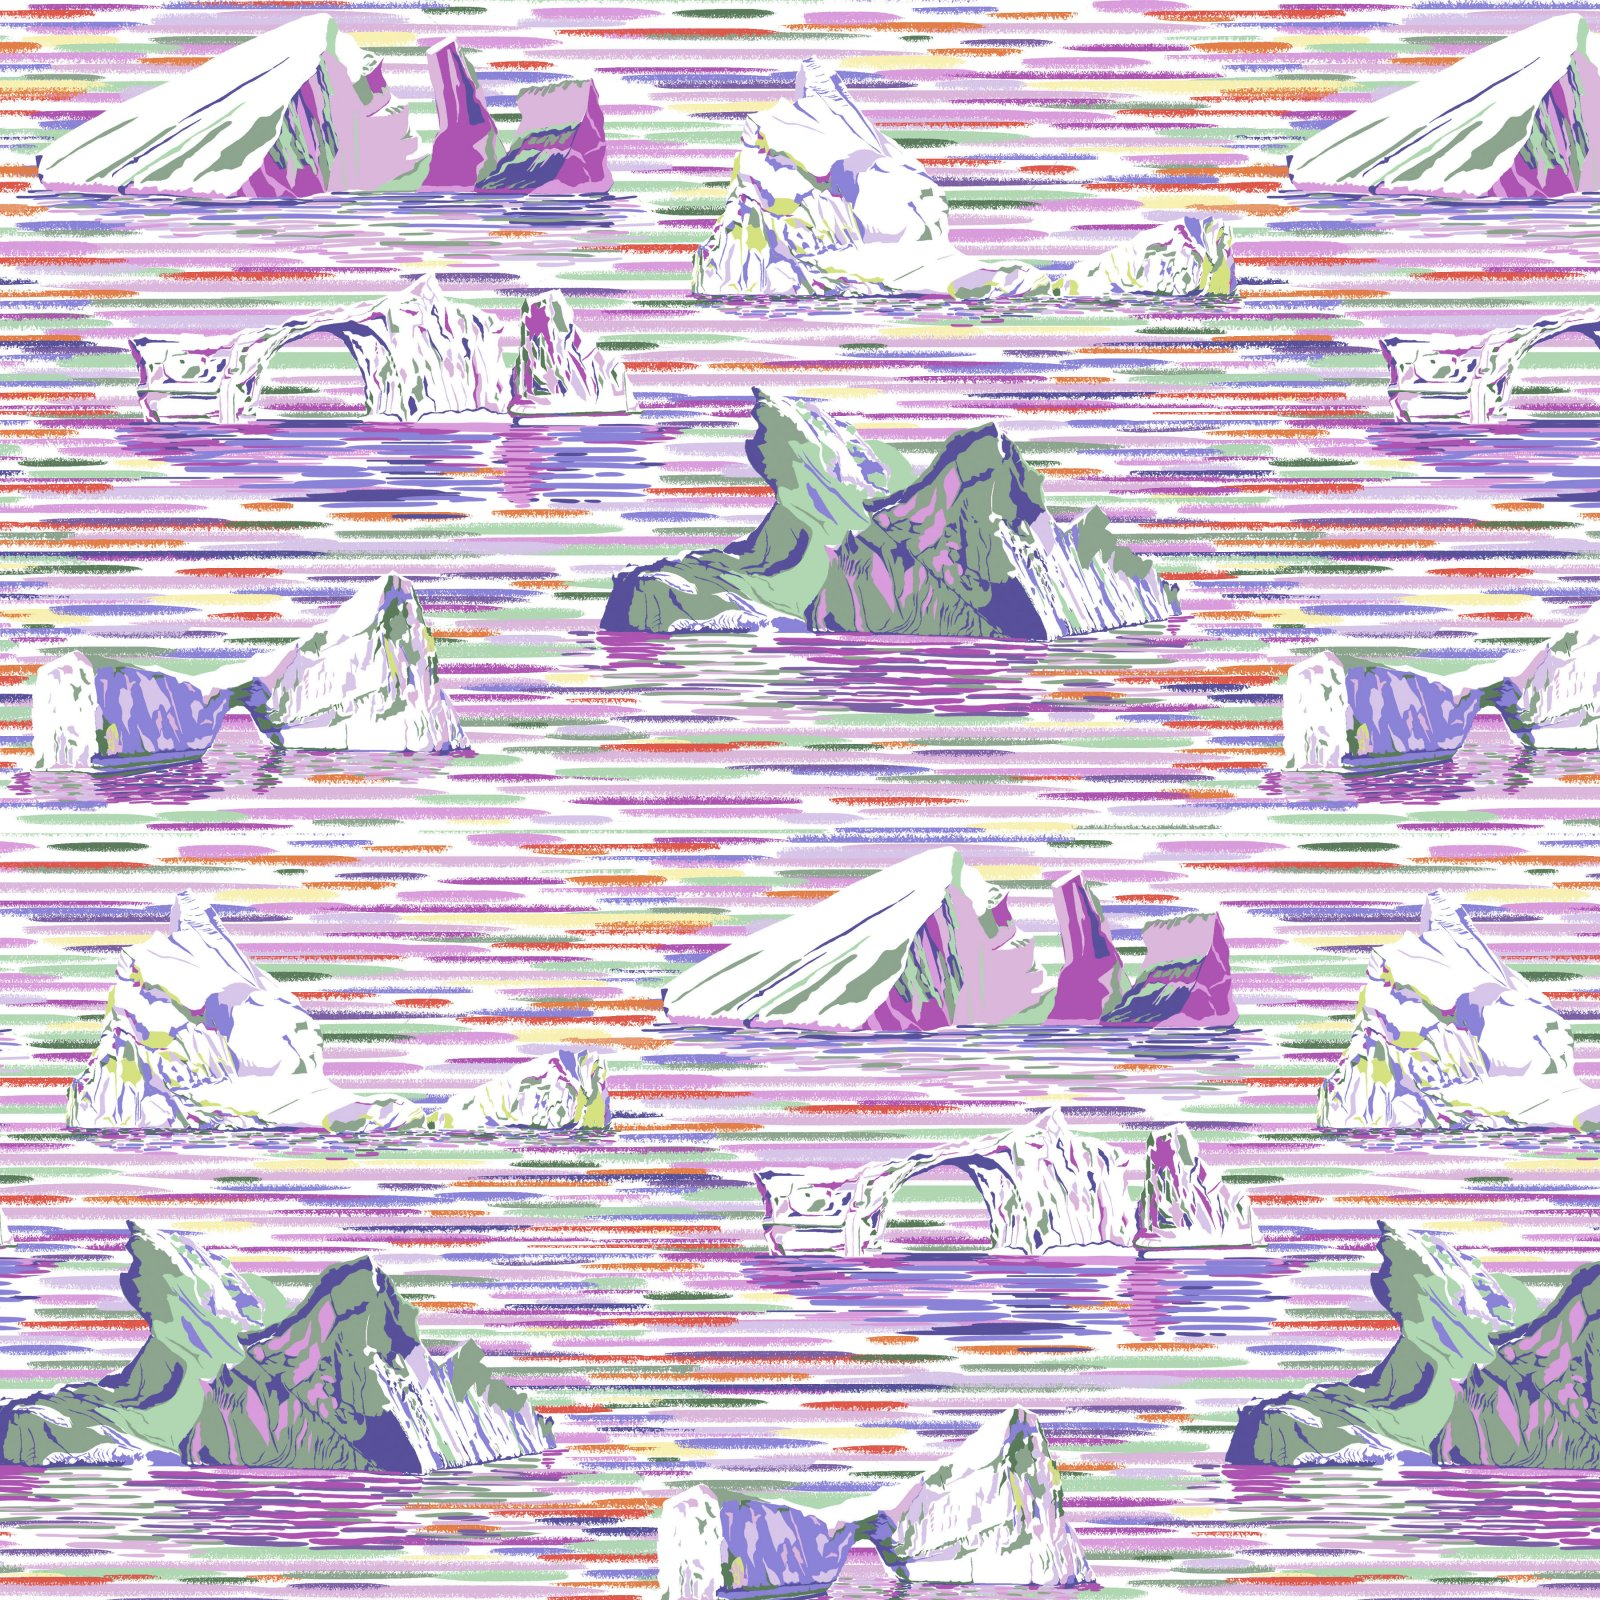 PWLT018.LAVENDER - Free Spirit Migration Icebergs - Lavender